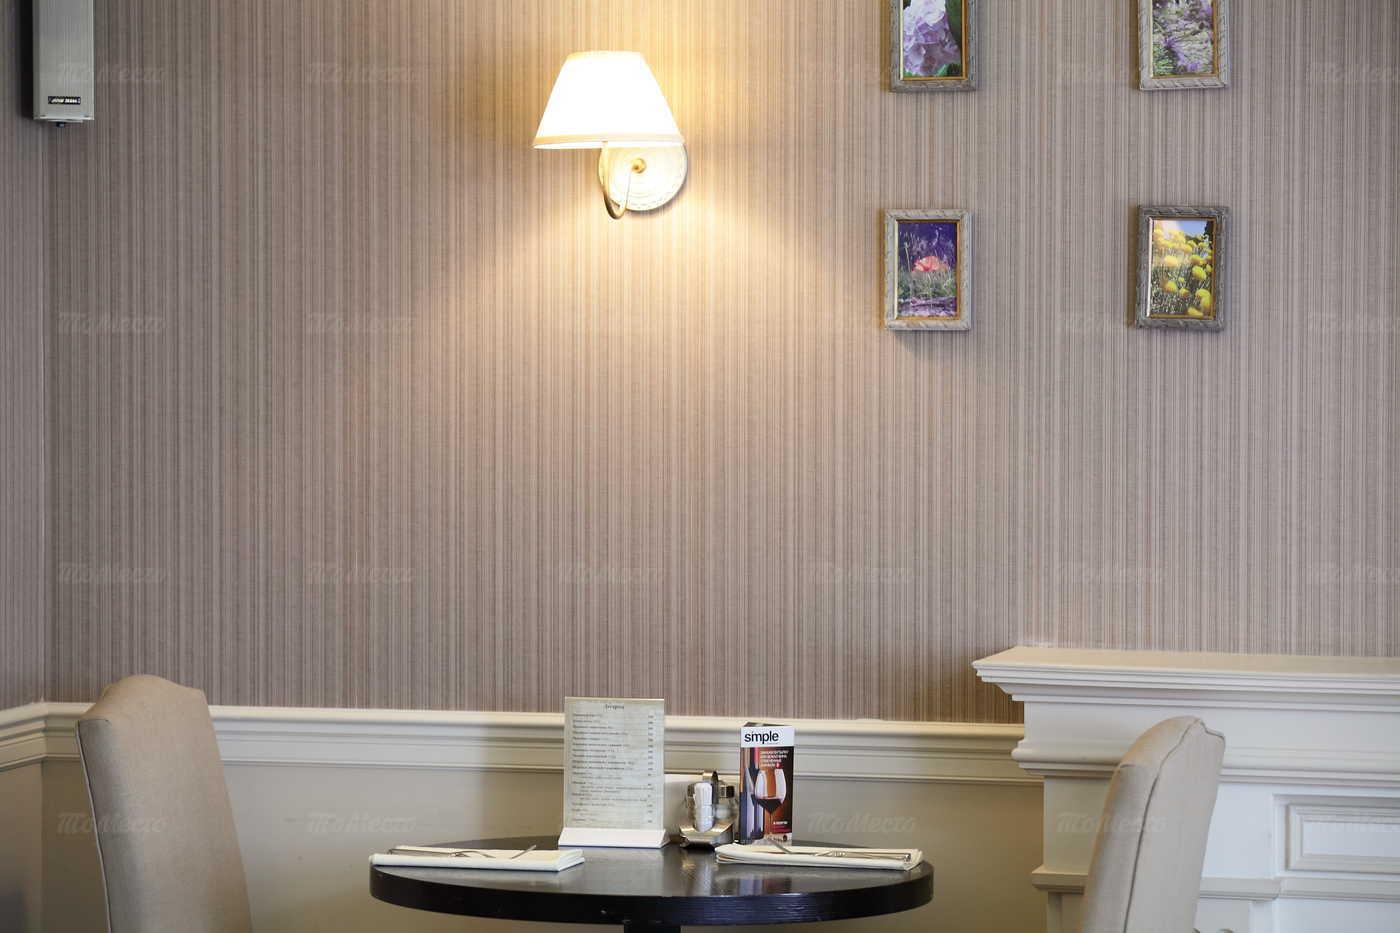 Ресторан Semplice (Траттория Семпличе) на улице Чаплыгина фото 13